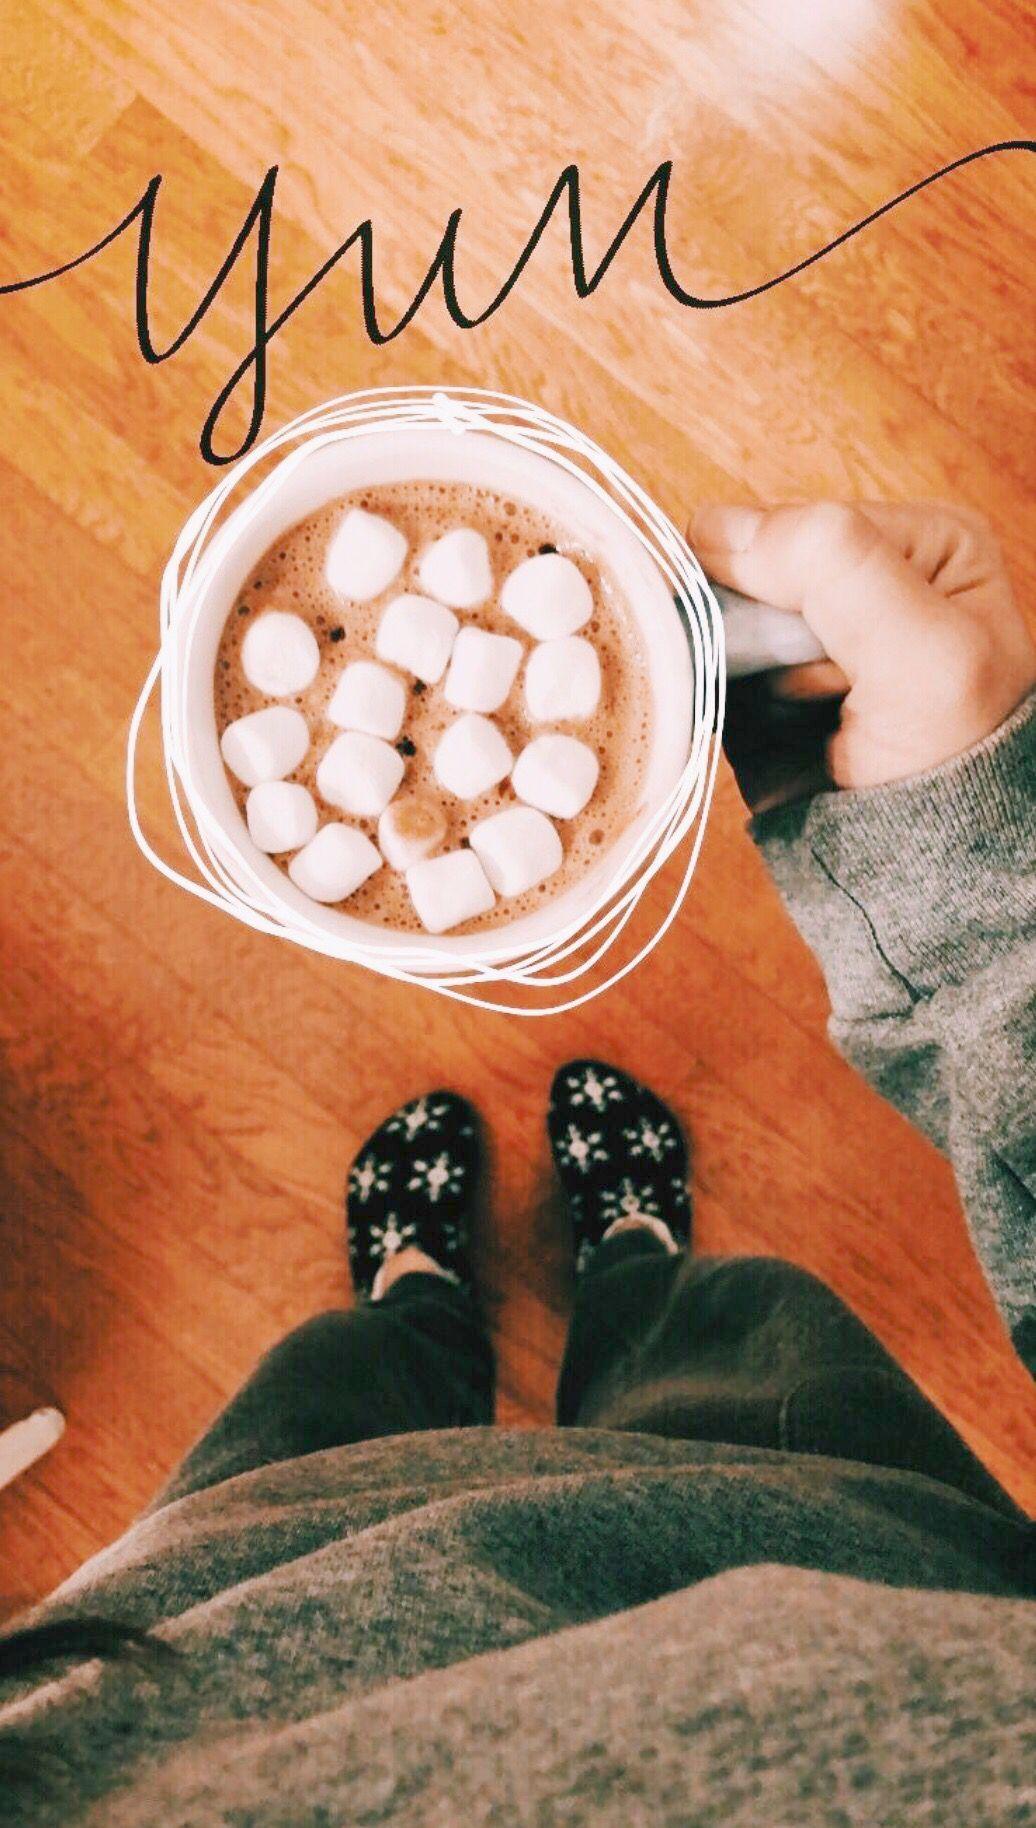 Coffee Cake Taste By Coffee Gator Coffee Table Glass Replacement Versus Coffee Maker Renta In 2020 Instagram Story Creative Instagram Stories Instagram Story Ideas